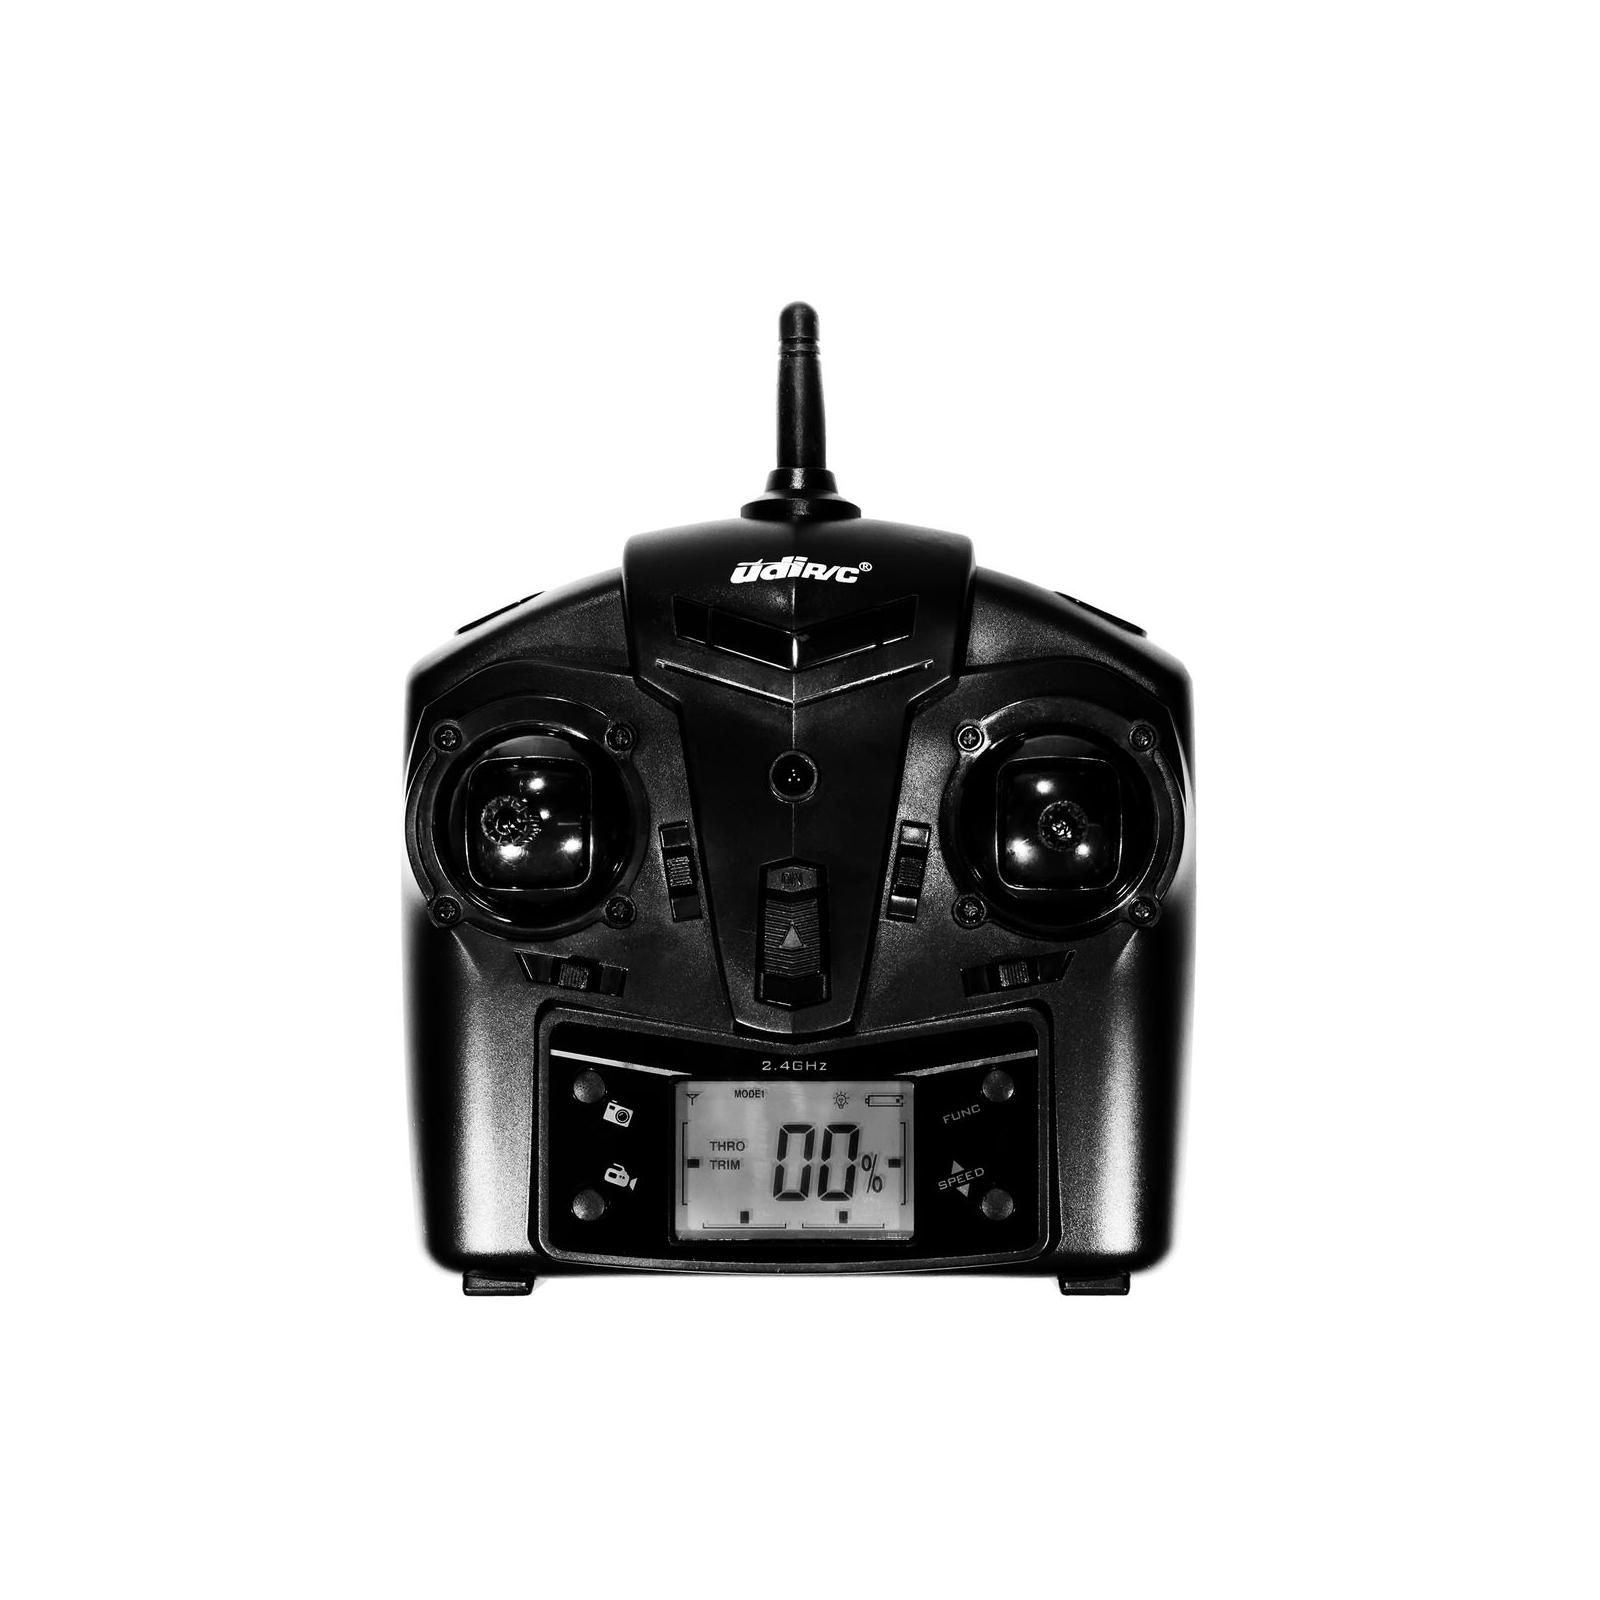 Квадрокоптер UDIRC U842 FALCON 2,4 GHz 486 мм HD бортовая камера 4CH (U842 White) изображение 5